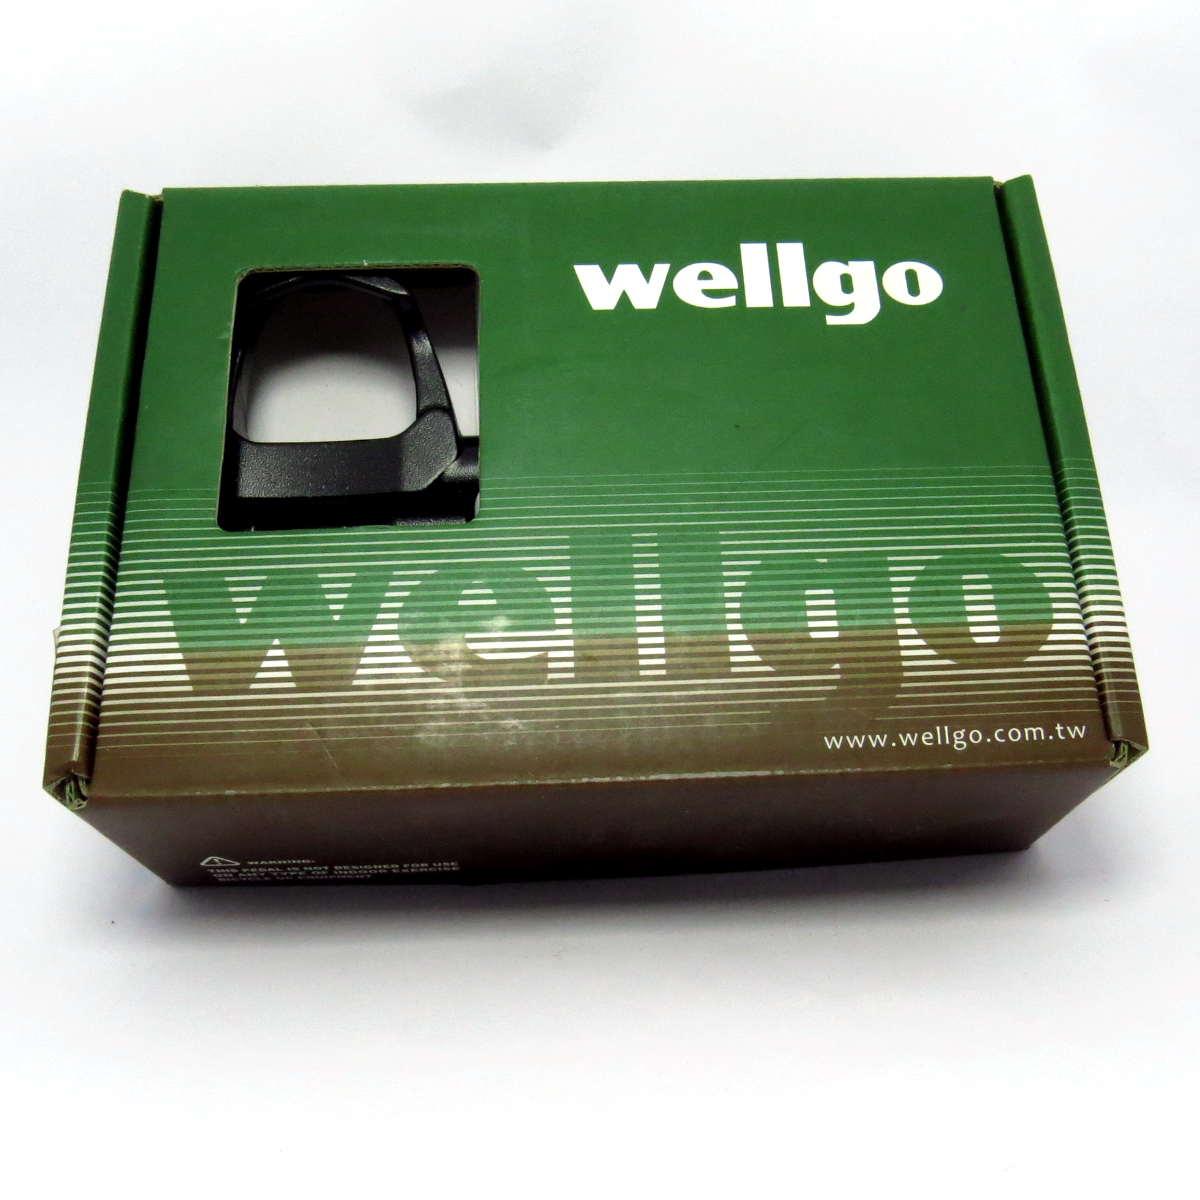 PEDAL CLIP SPEED R-096B- WELLGO